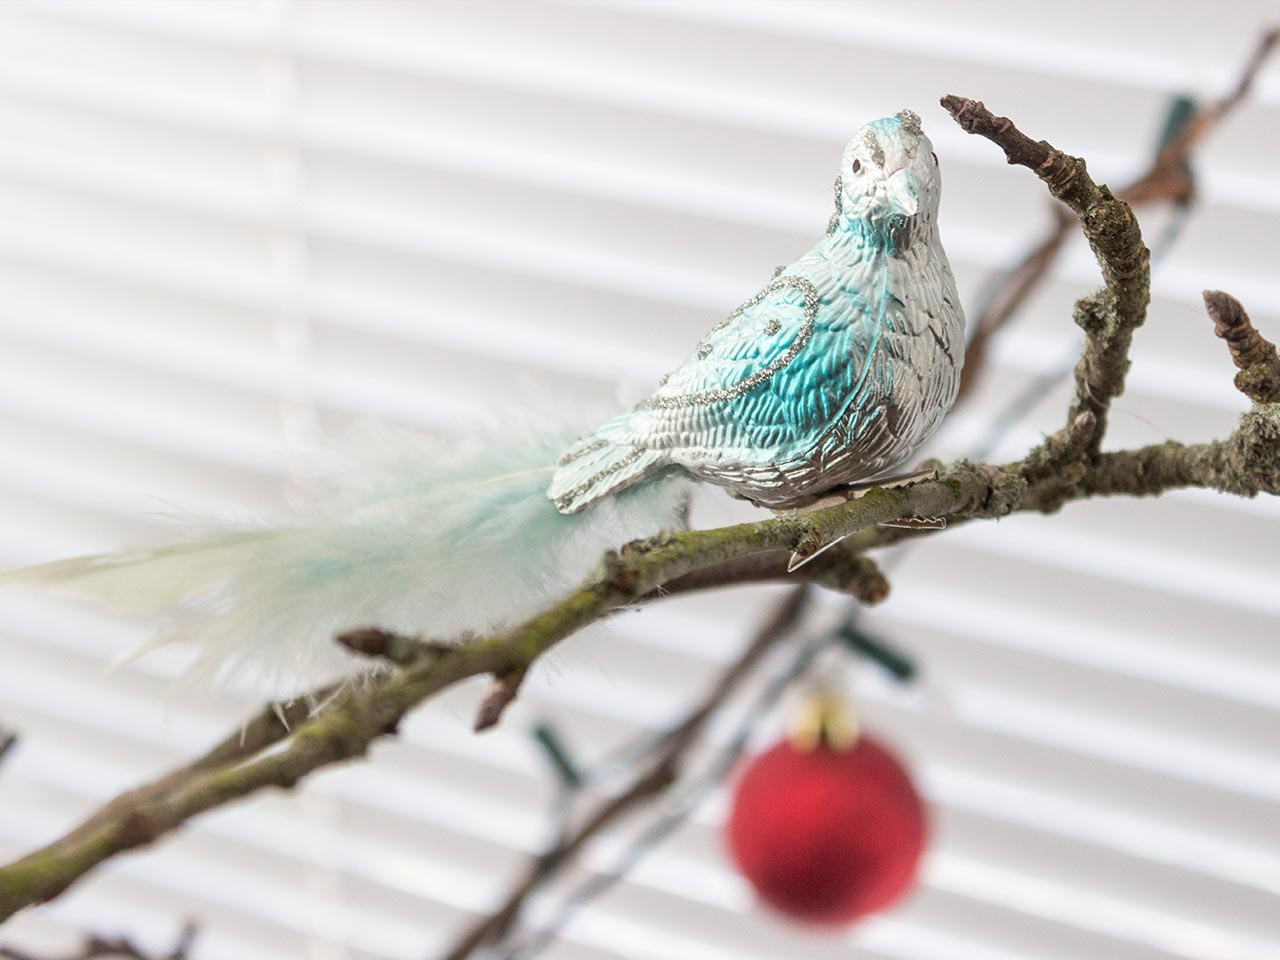 bird-and-bauble-sula-maga-esberg